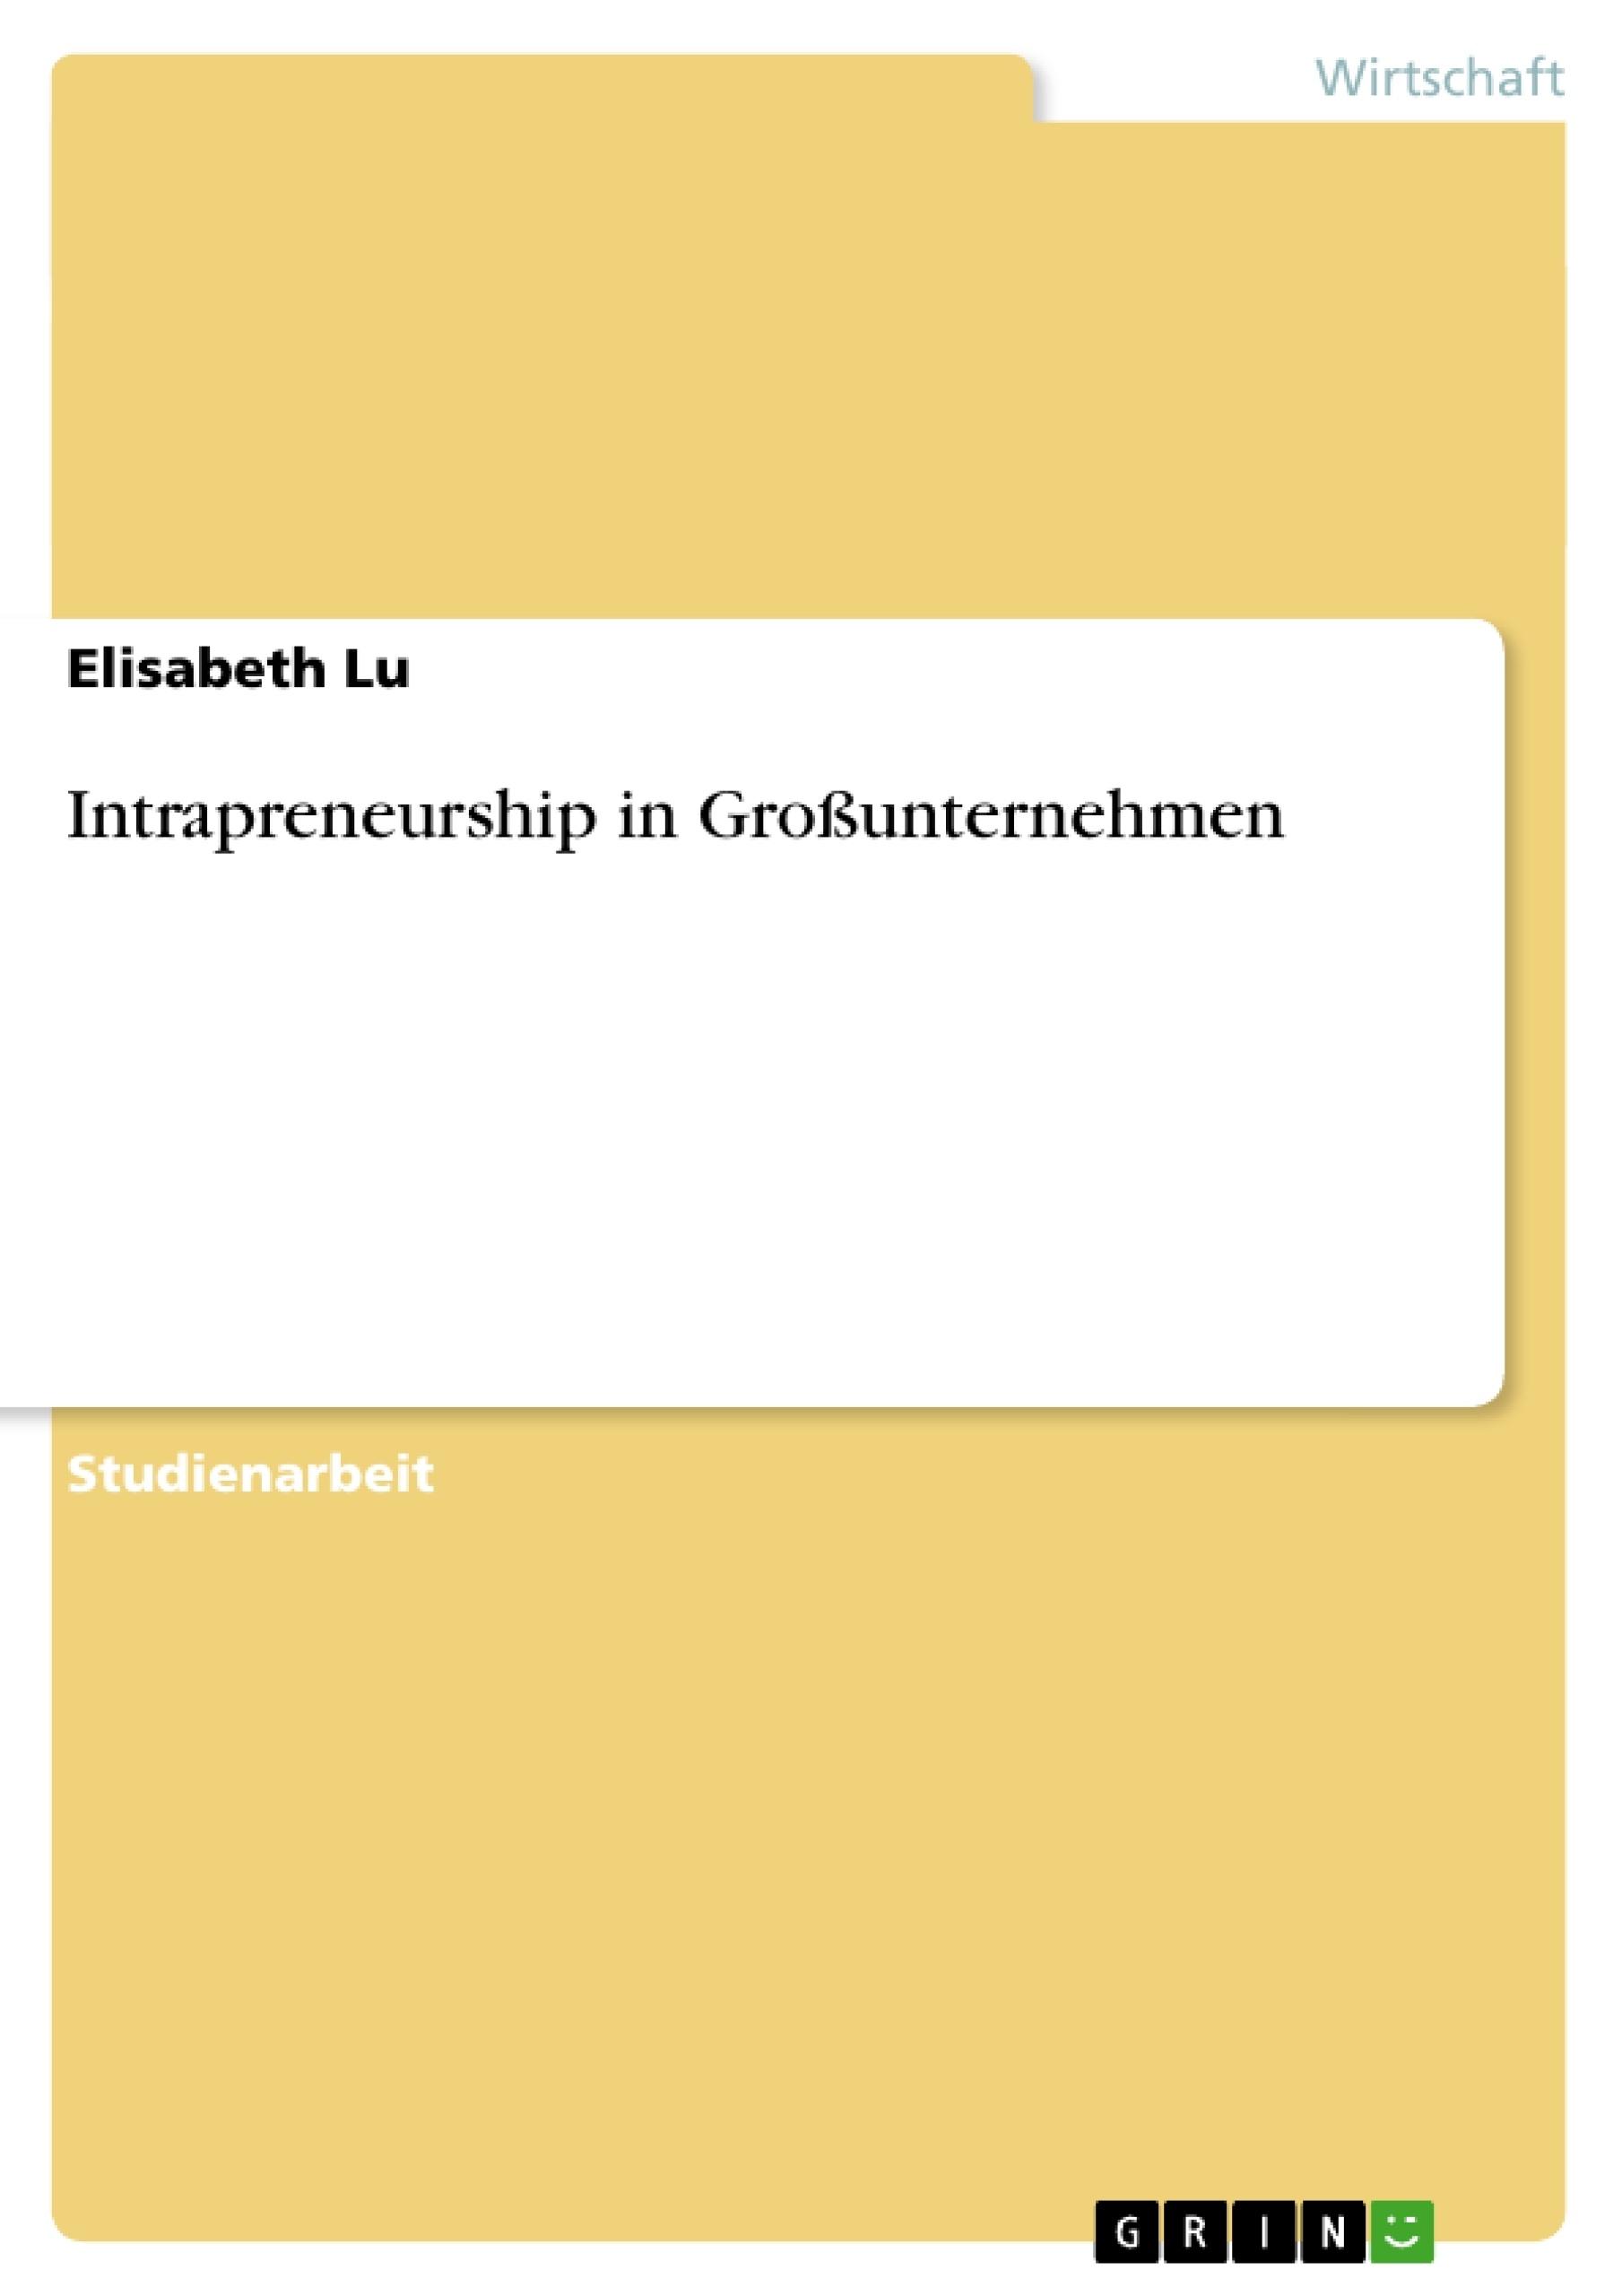 Titel: Intrapreneurship in Großunternehmen